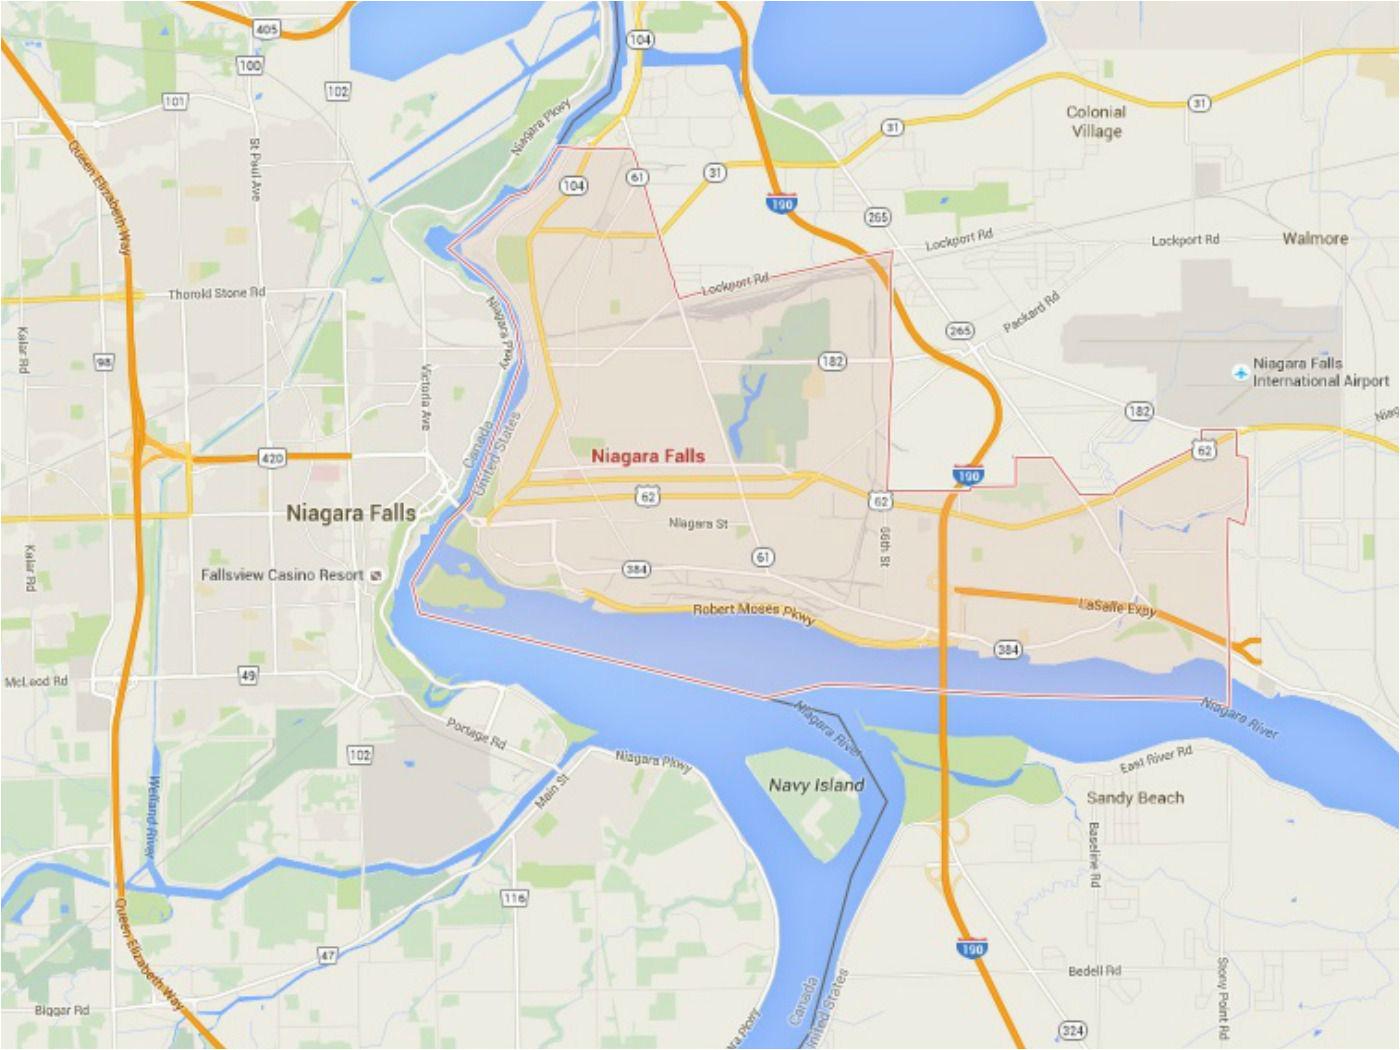 maps of new york nyc catskills niagara falls and more